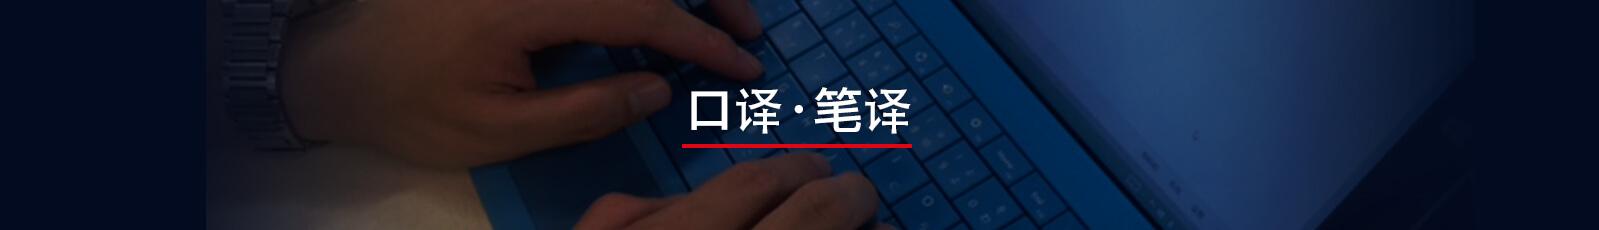 FLY MEDIA Asia 口译・笔译